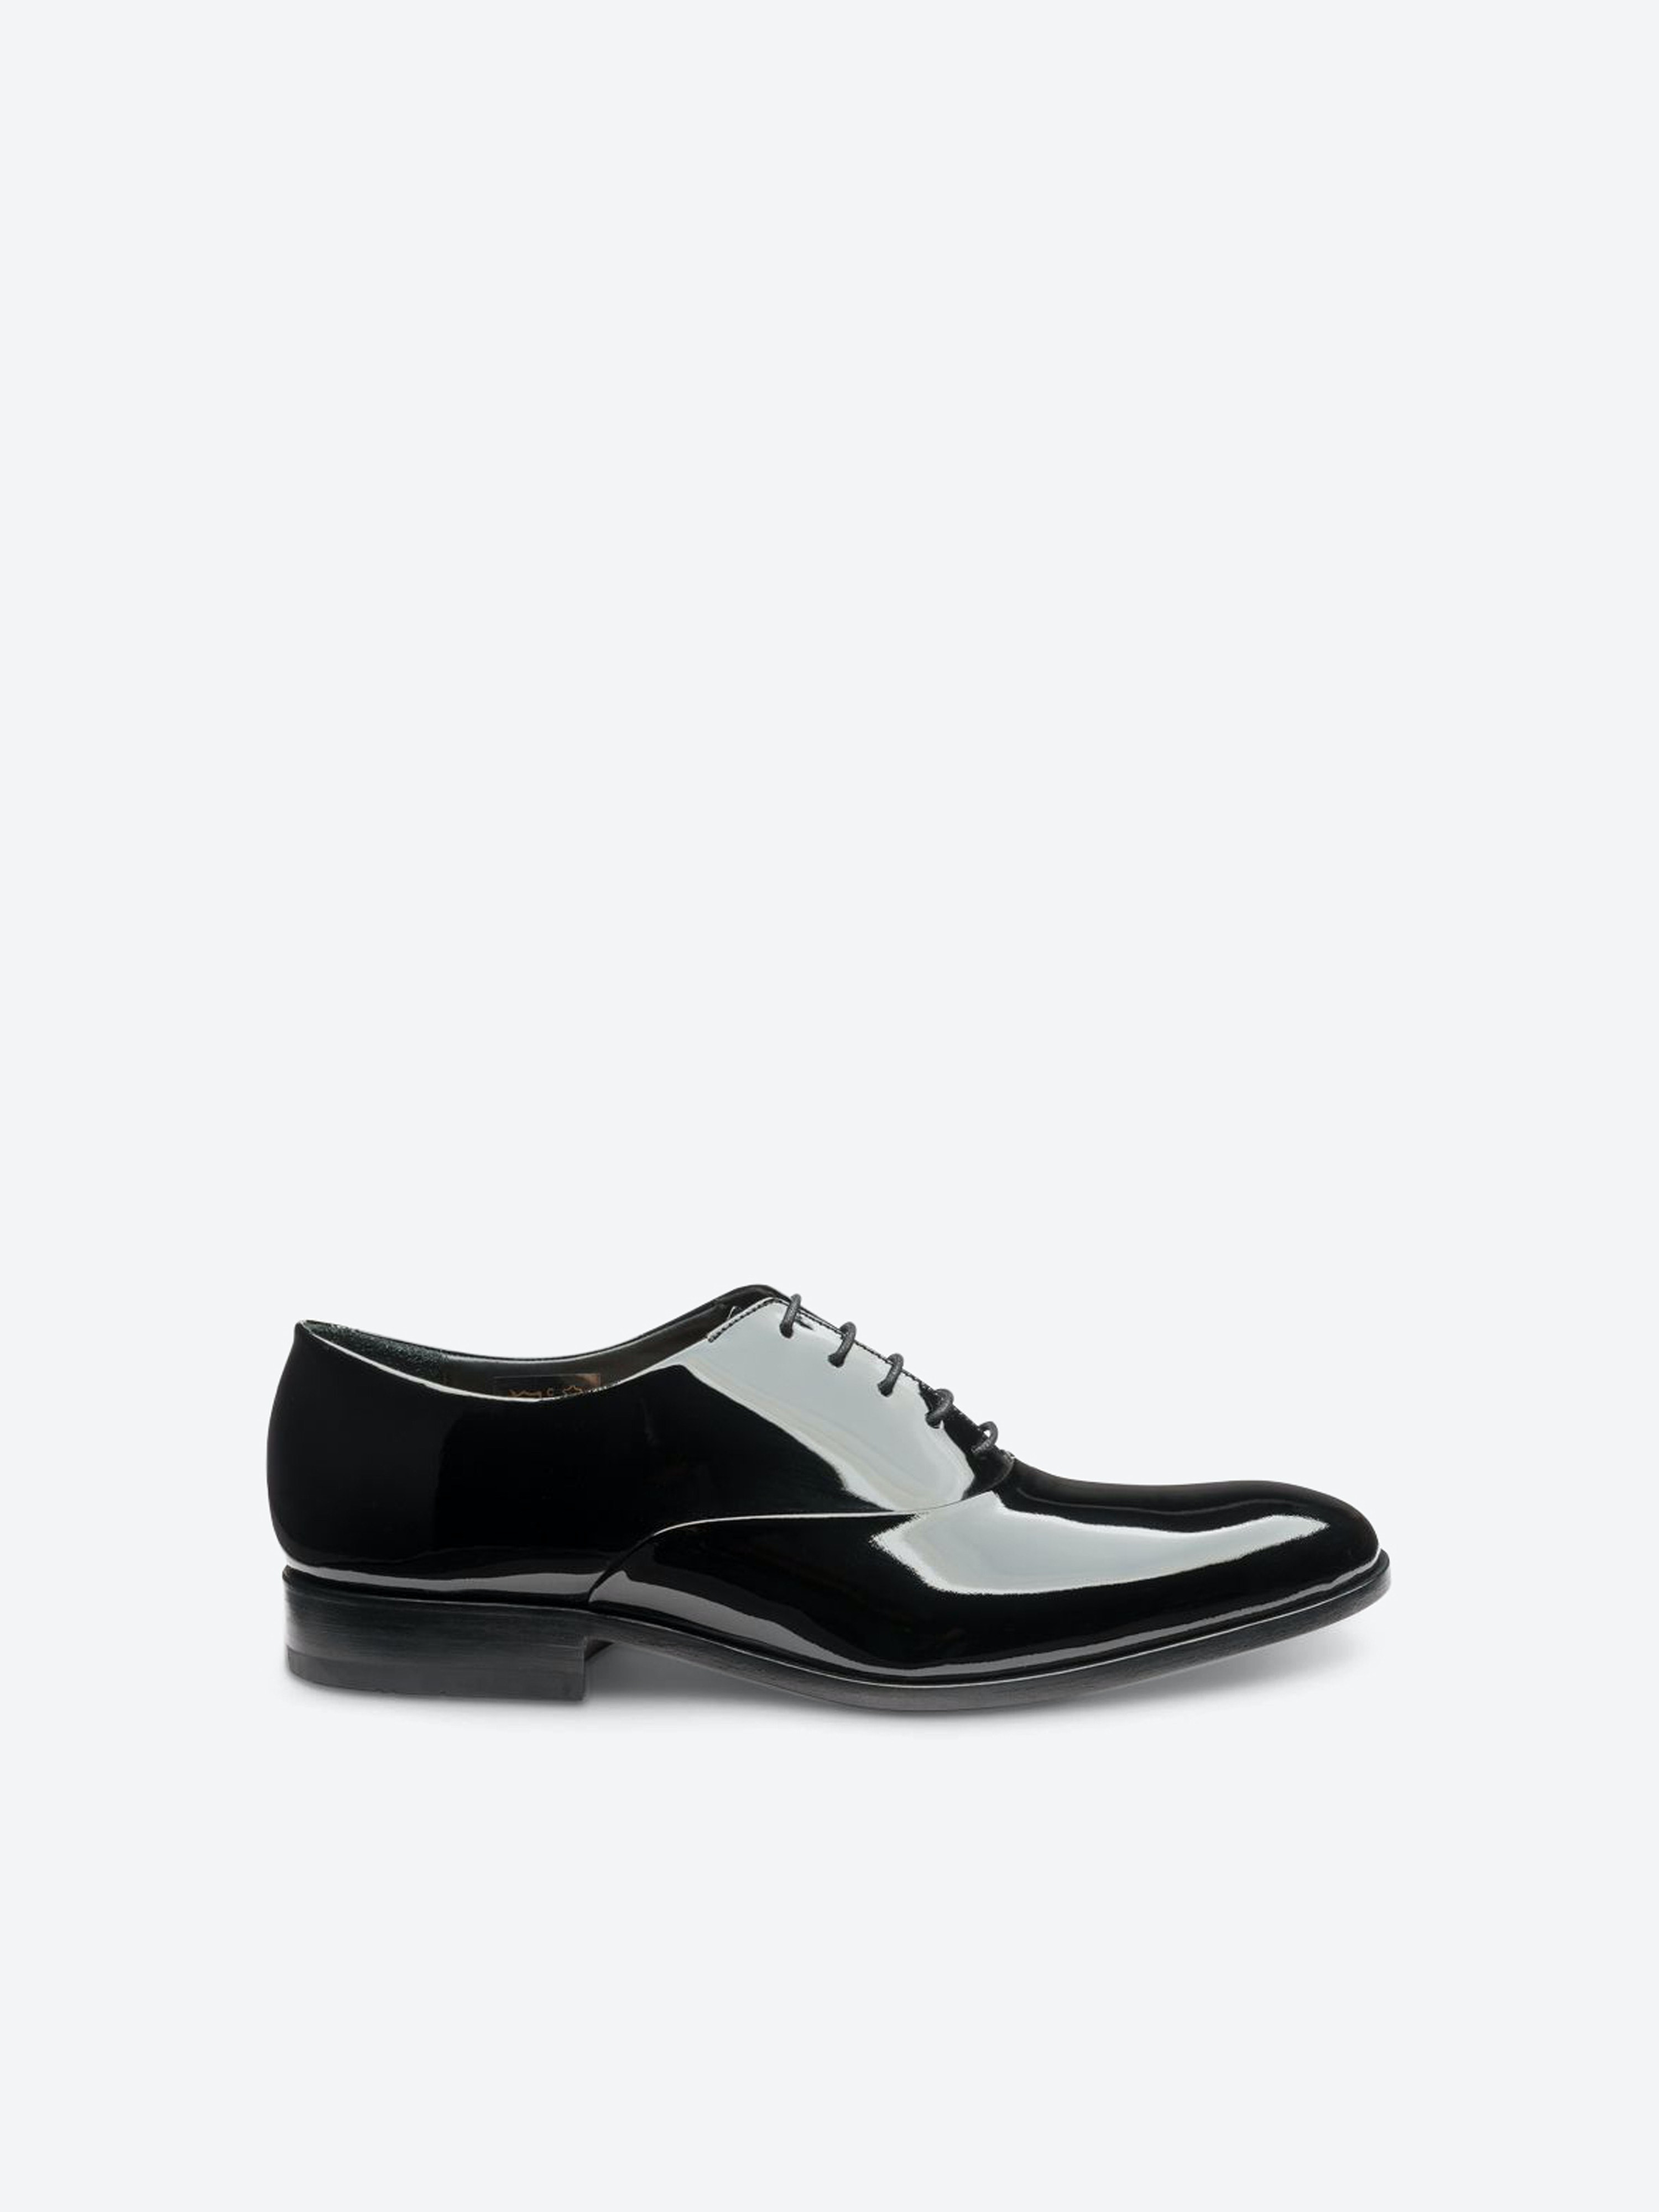 Loake Patent Leather Shoes Black | Men